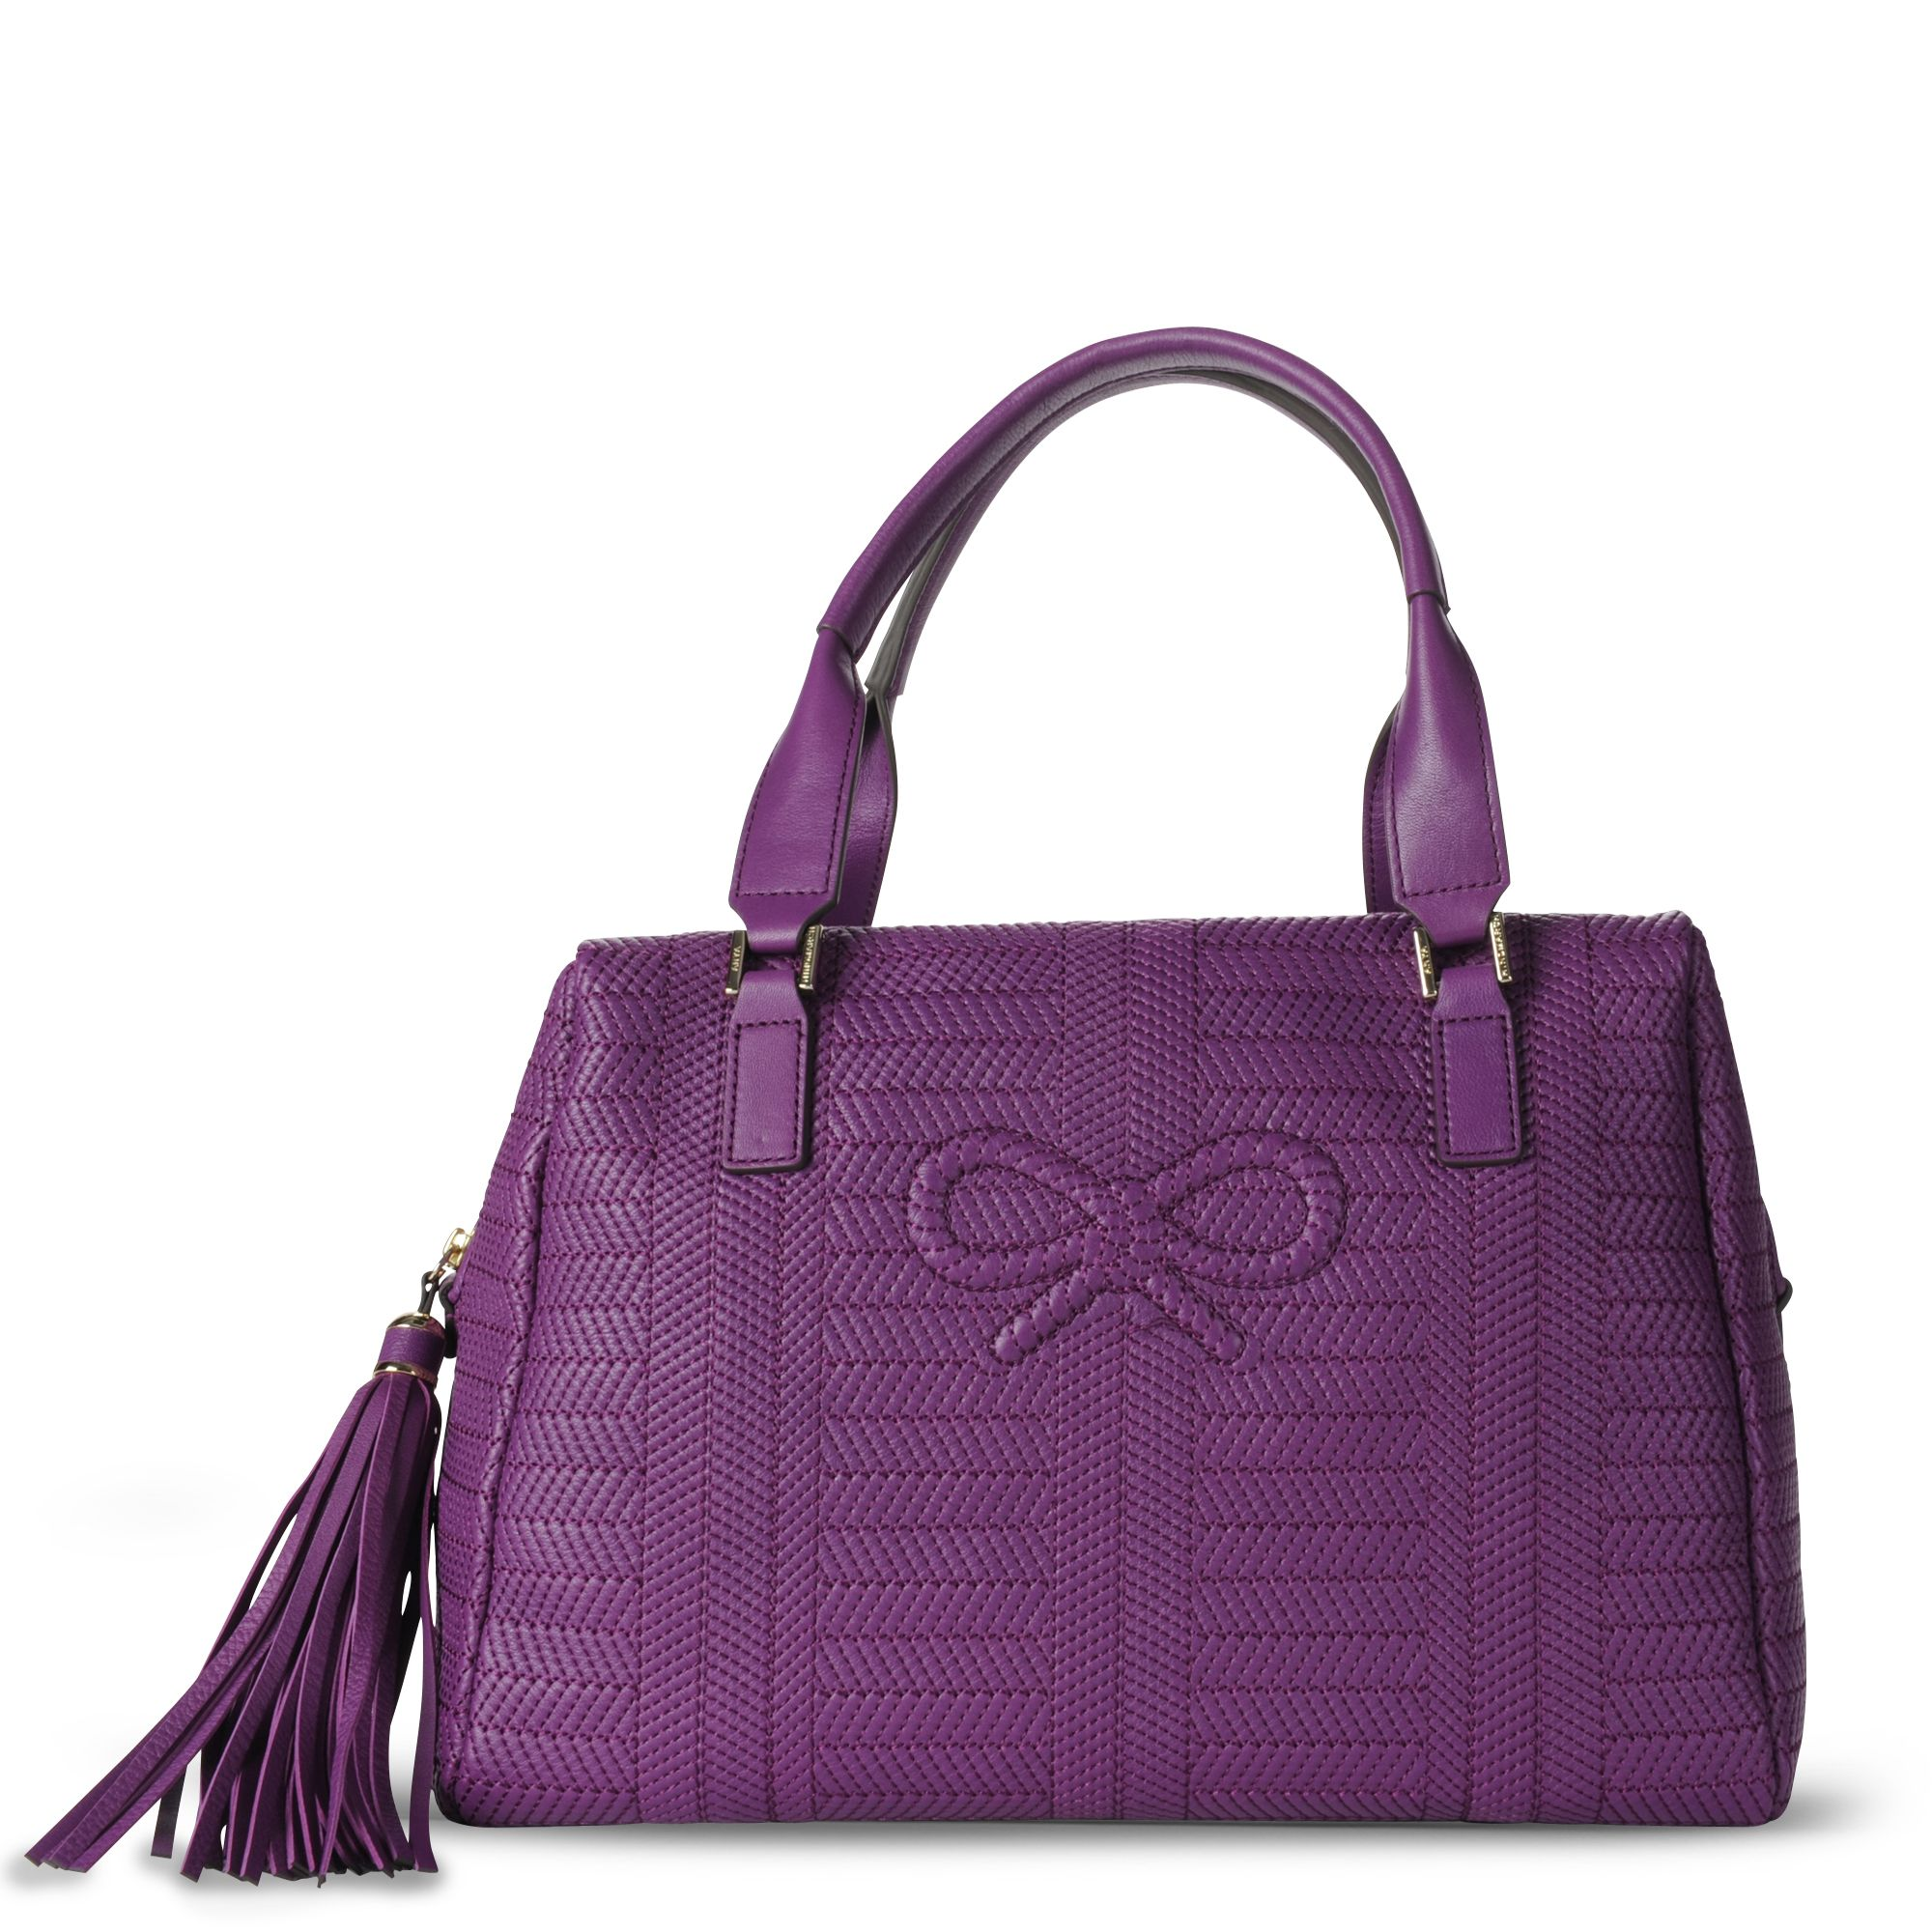 Anya Hindmarch Fergus Violet Woven Bag in Purple (violet)